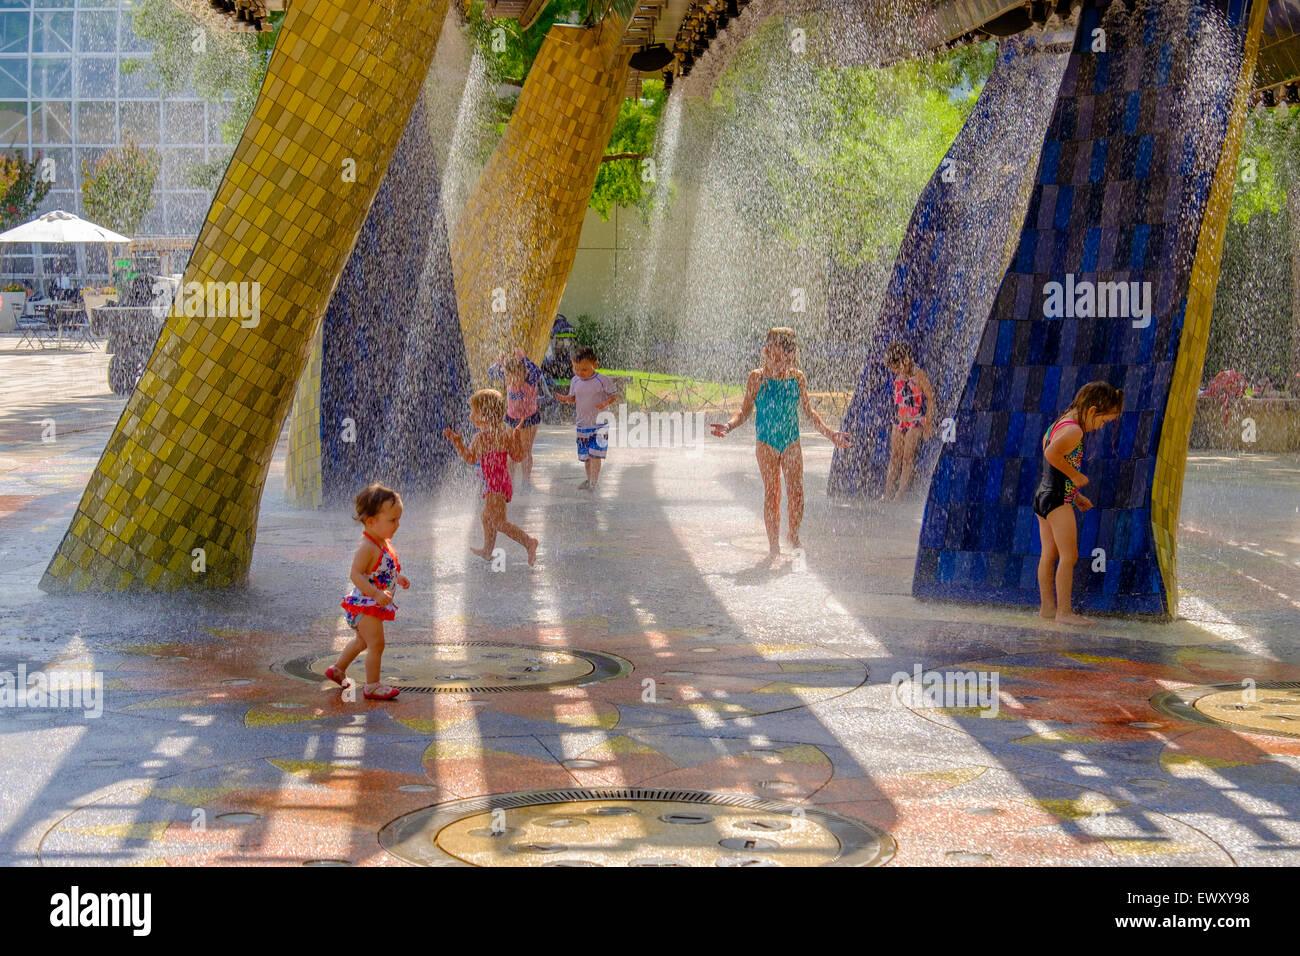 Children Play At A Splash Park At The Myriad Botanical Gardens In Oklahoma  City, Oklahoma, USA